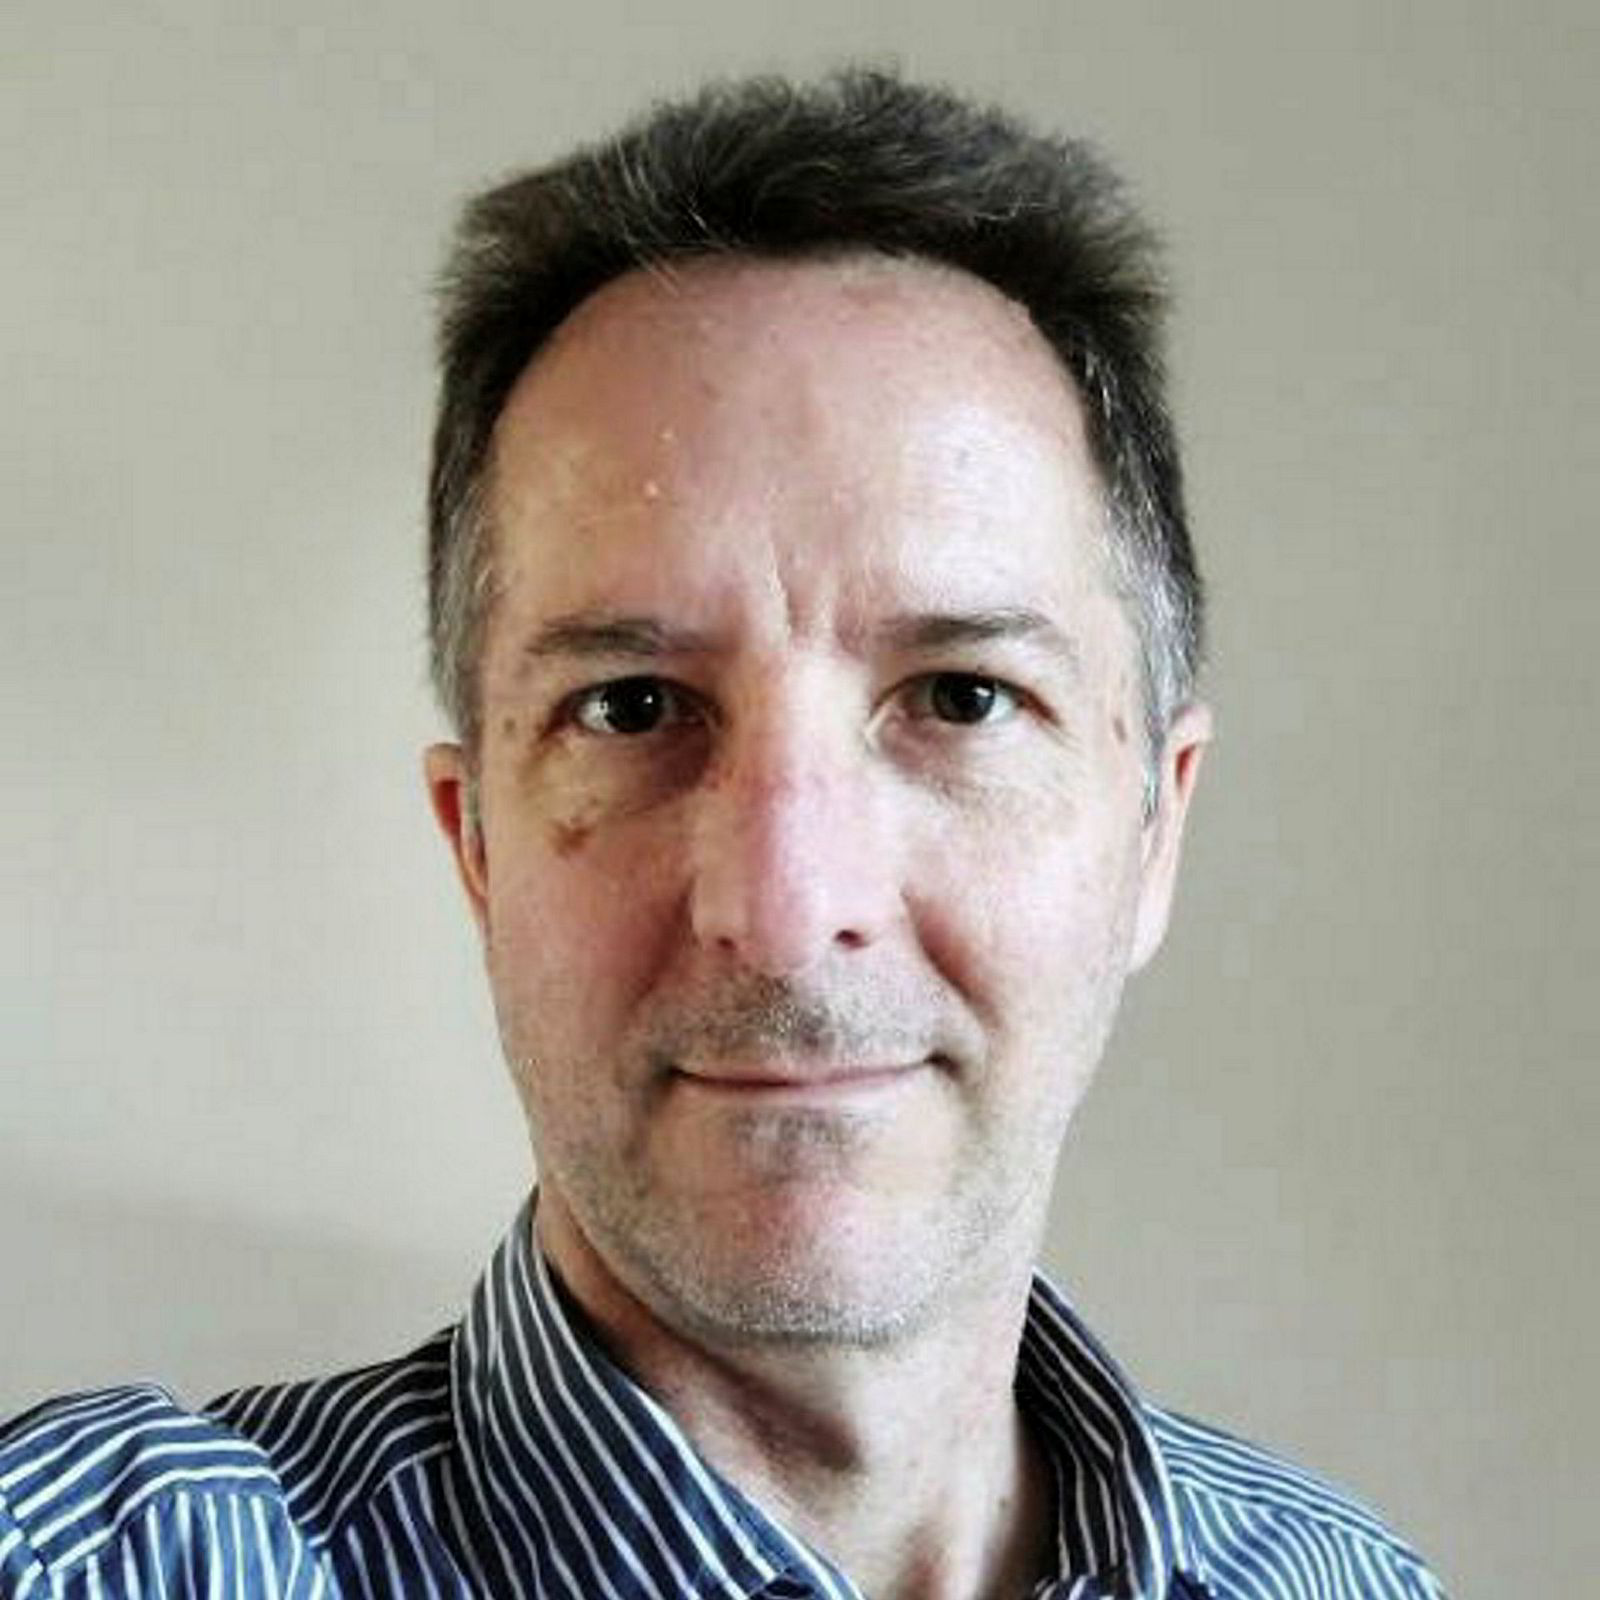 Ian Smith, kommisjonær i Esport Integrity Coalition (ESIC).